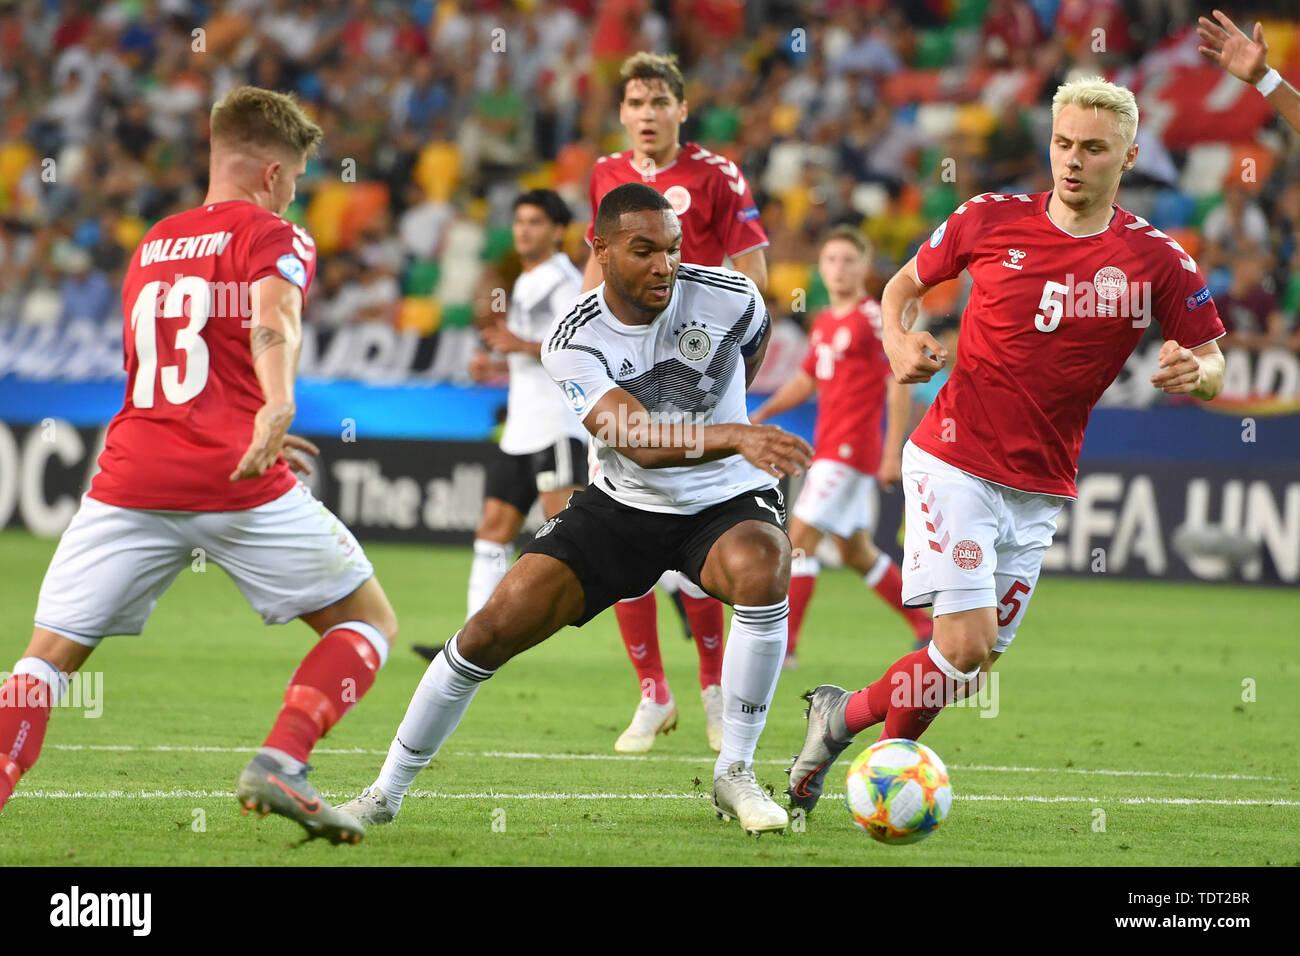 Udine, Italien. 17th June, 2019. Jonathan TAH (GER), action, duels versus Victor NELSSON (DEN, re) and Mads PEDERSEN (DEN). Germany (GER) -Daenemark (DEN) 3-1, on 17.06.2019 Stadio Friuli Udine. Football U-21, UEFA Under21 European Championship in Italy/SanMarino from 16.-30.06.2019. | Usage worldwide Credit: dpa/Alamy Live News - Stock Image